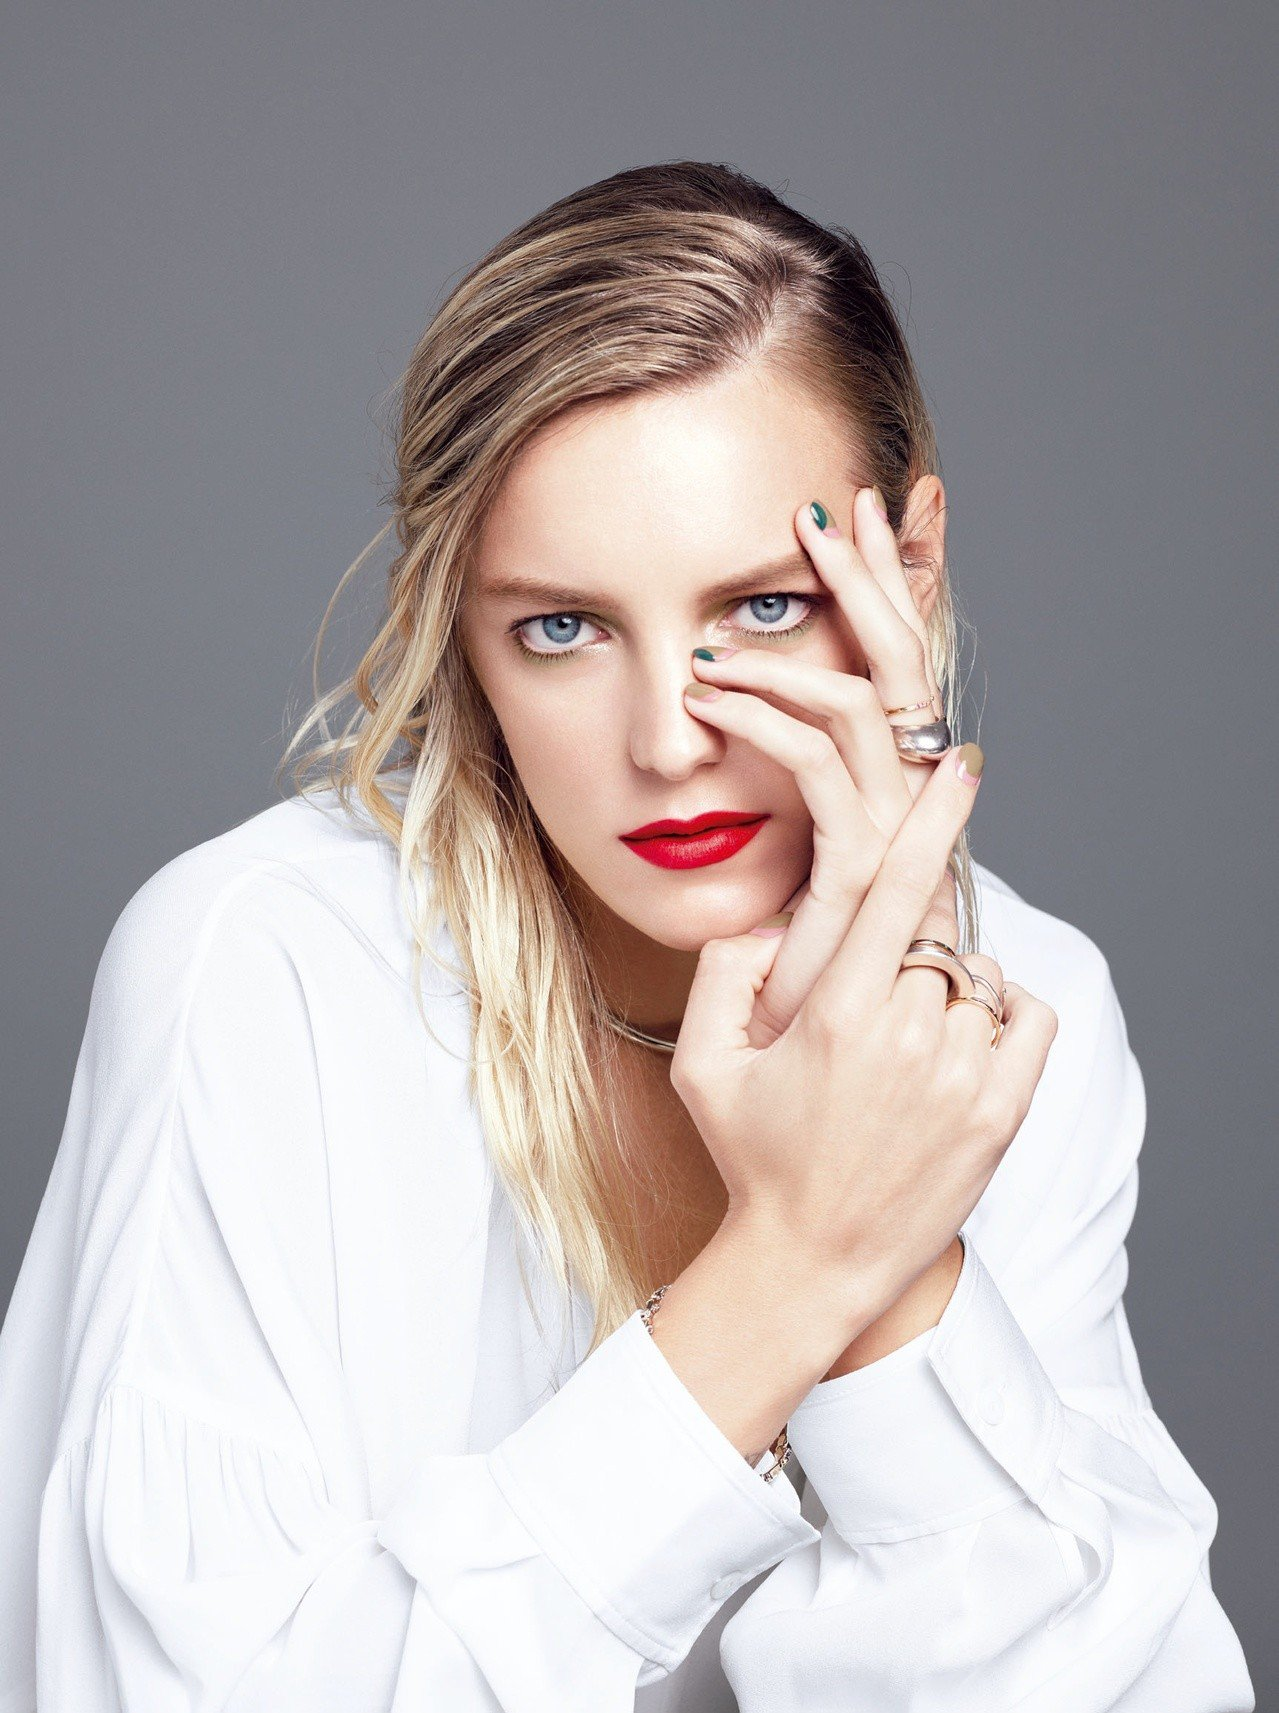 THREE 2019年品牌創立滿10周年,首波發表的春妝回歸原點,以「唇膏」為重...